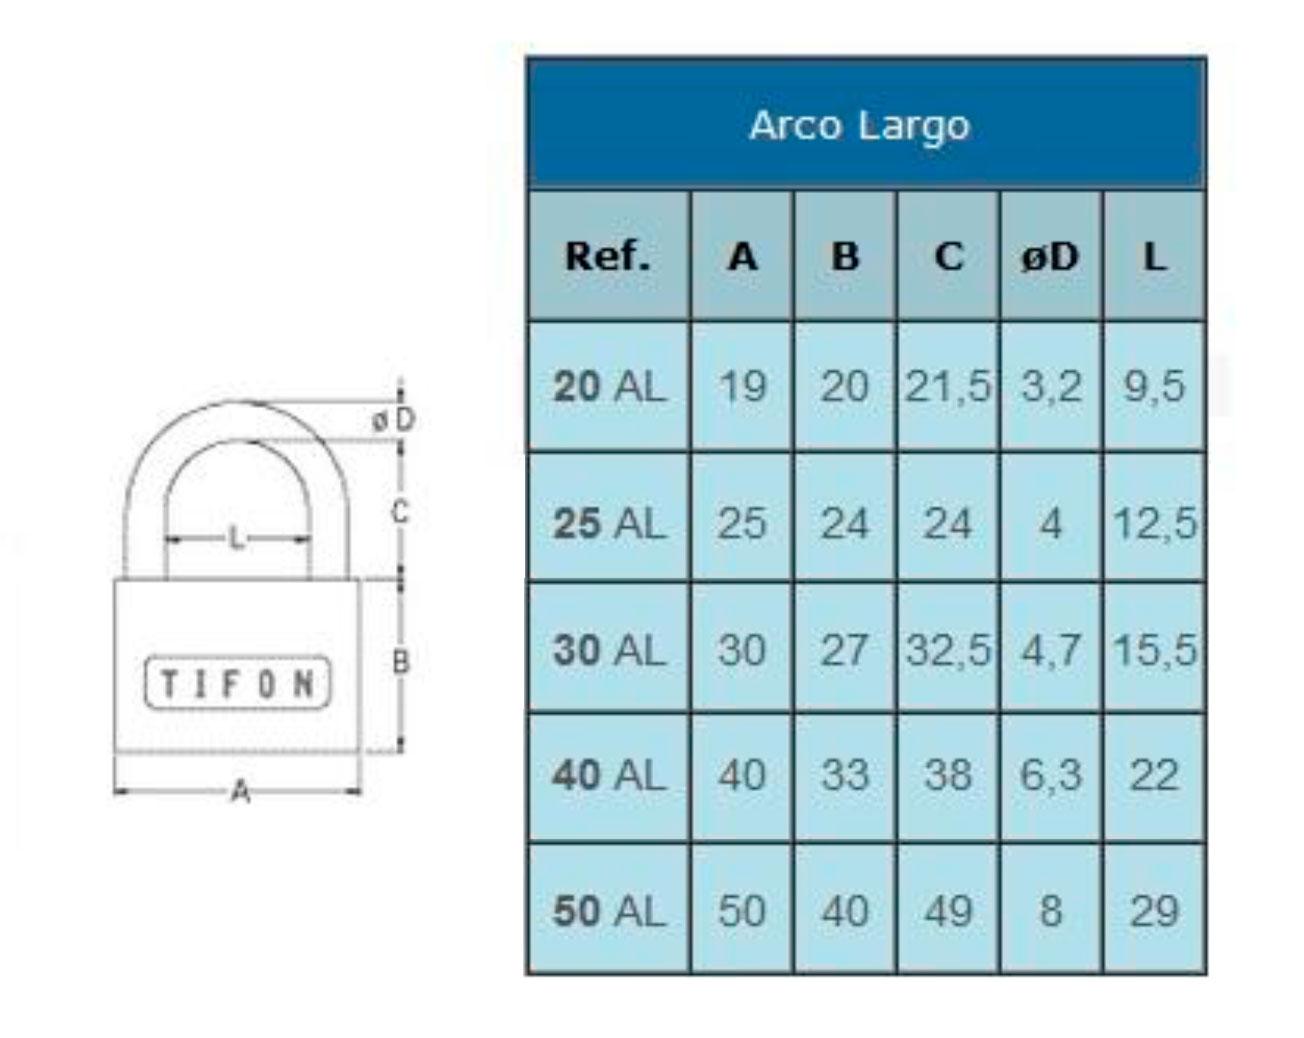 Candado IFAM Serie TIFON Arco Largo